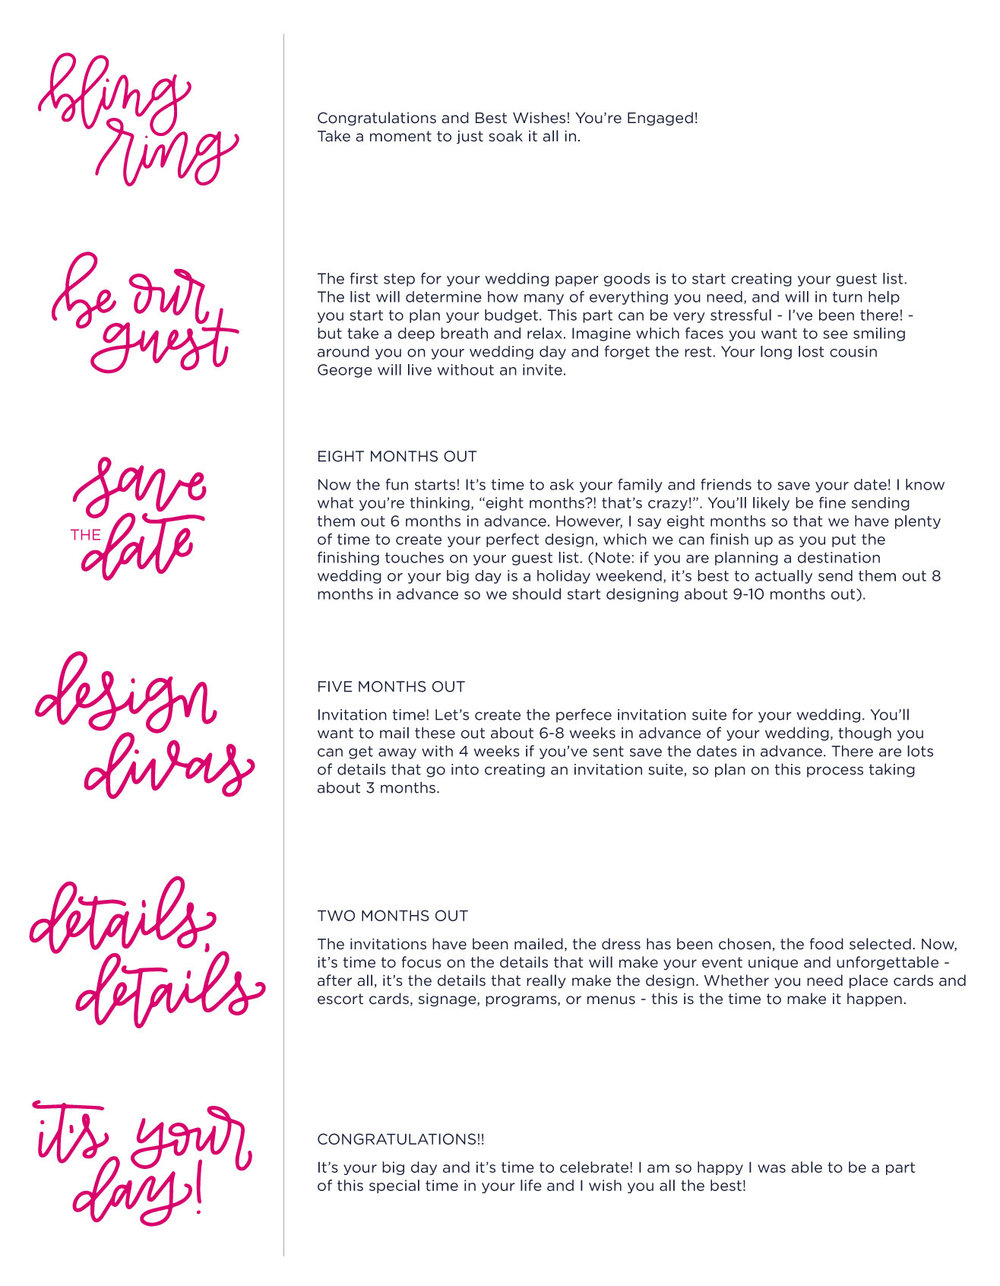 Wedding-Goods-Timeline.jpg